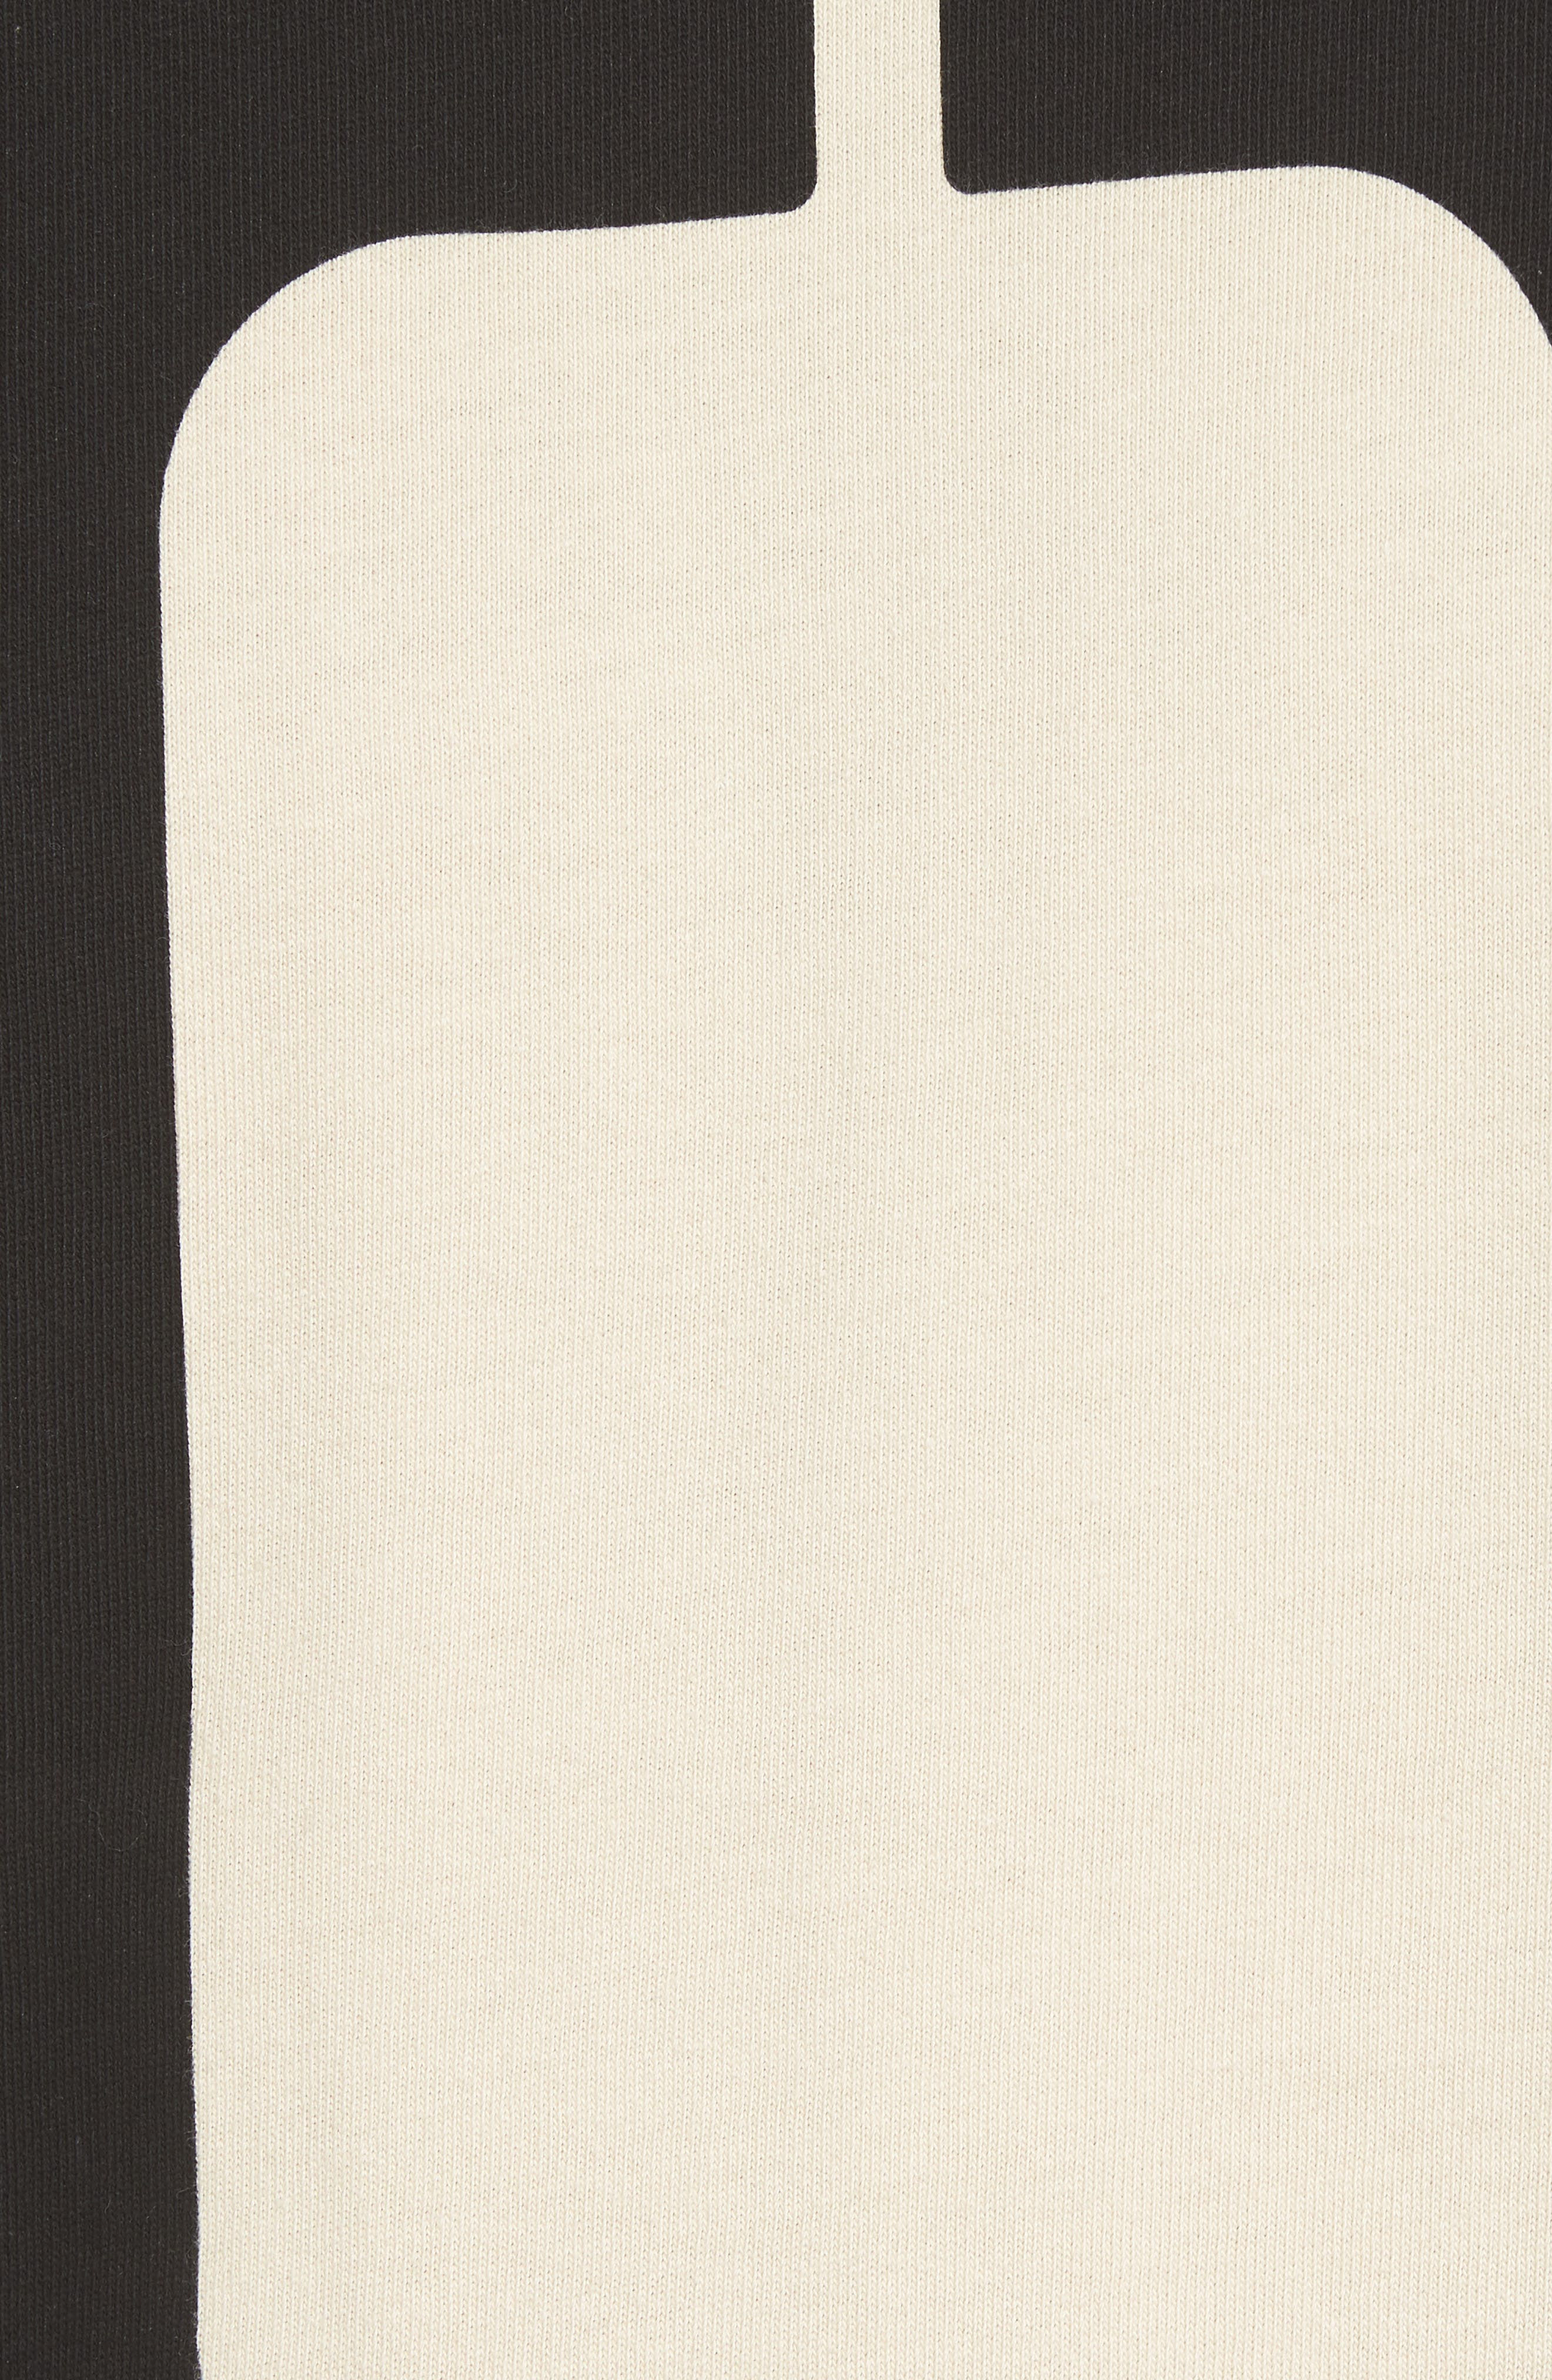 1960s Loose Graphic T-Shirt,                             Alternate thumbnail 5, color,                             Zero Sand Shell